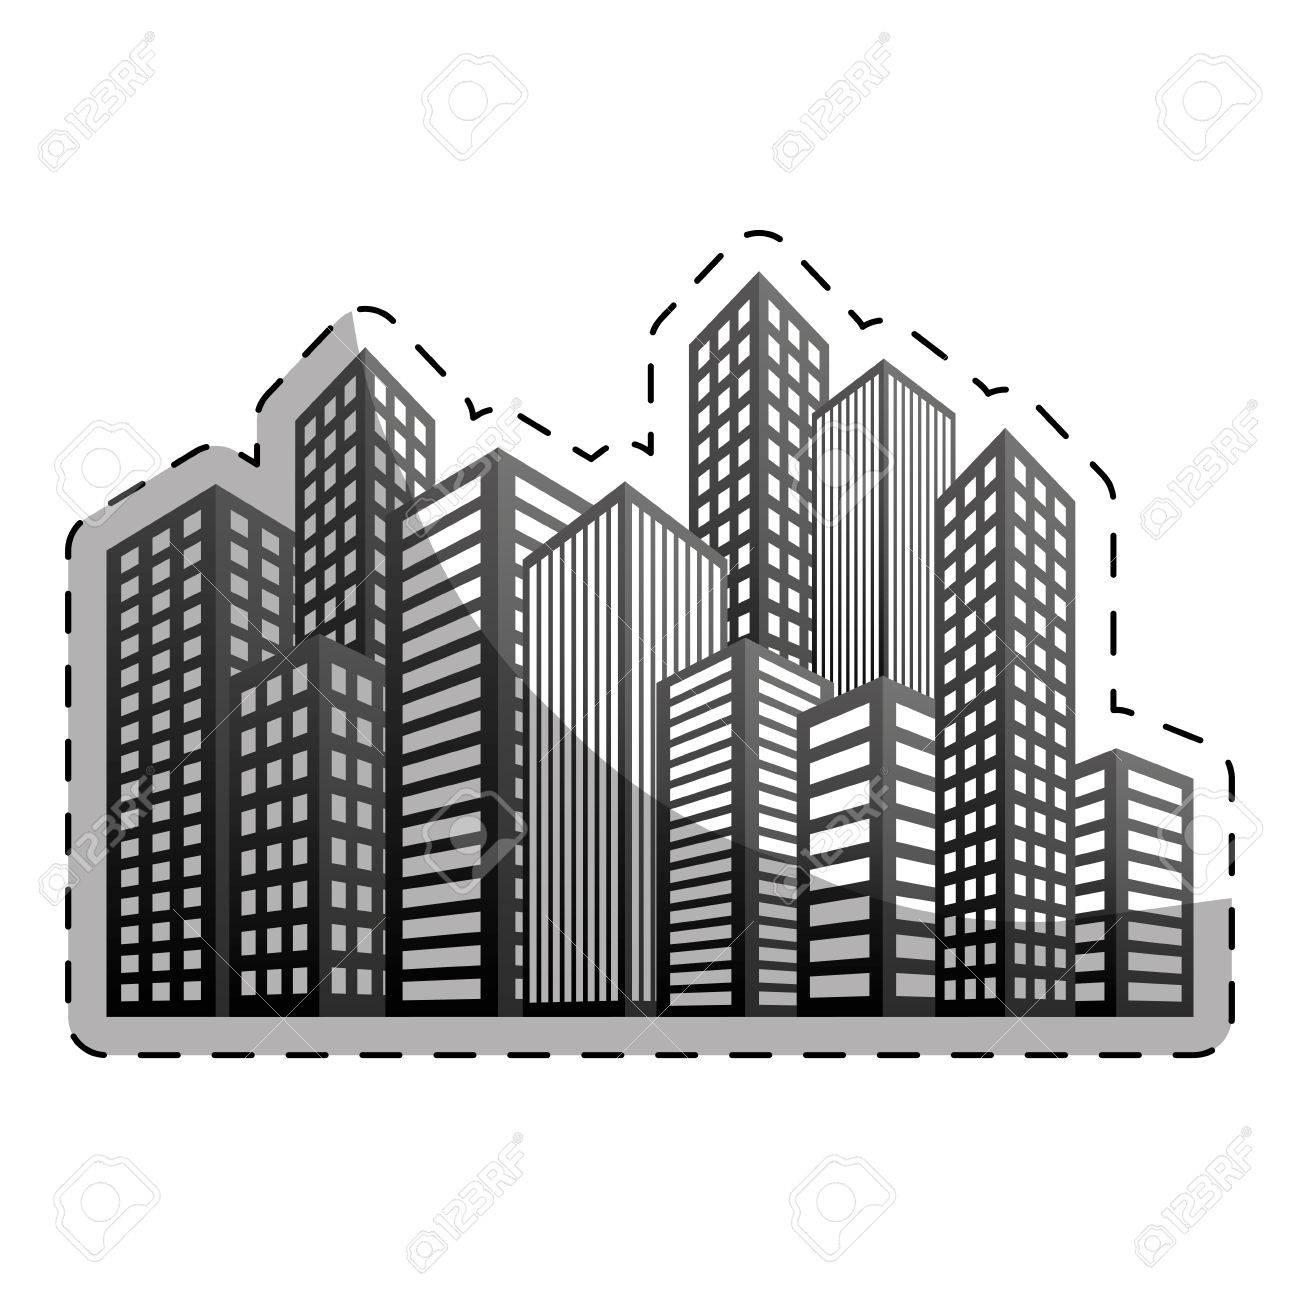 City Building Icon Image Line Sticker Vector Illustration Design Stock